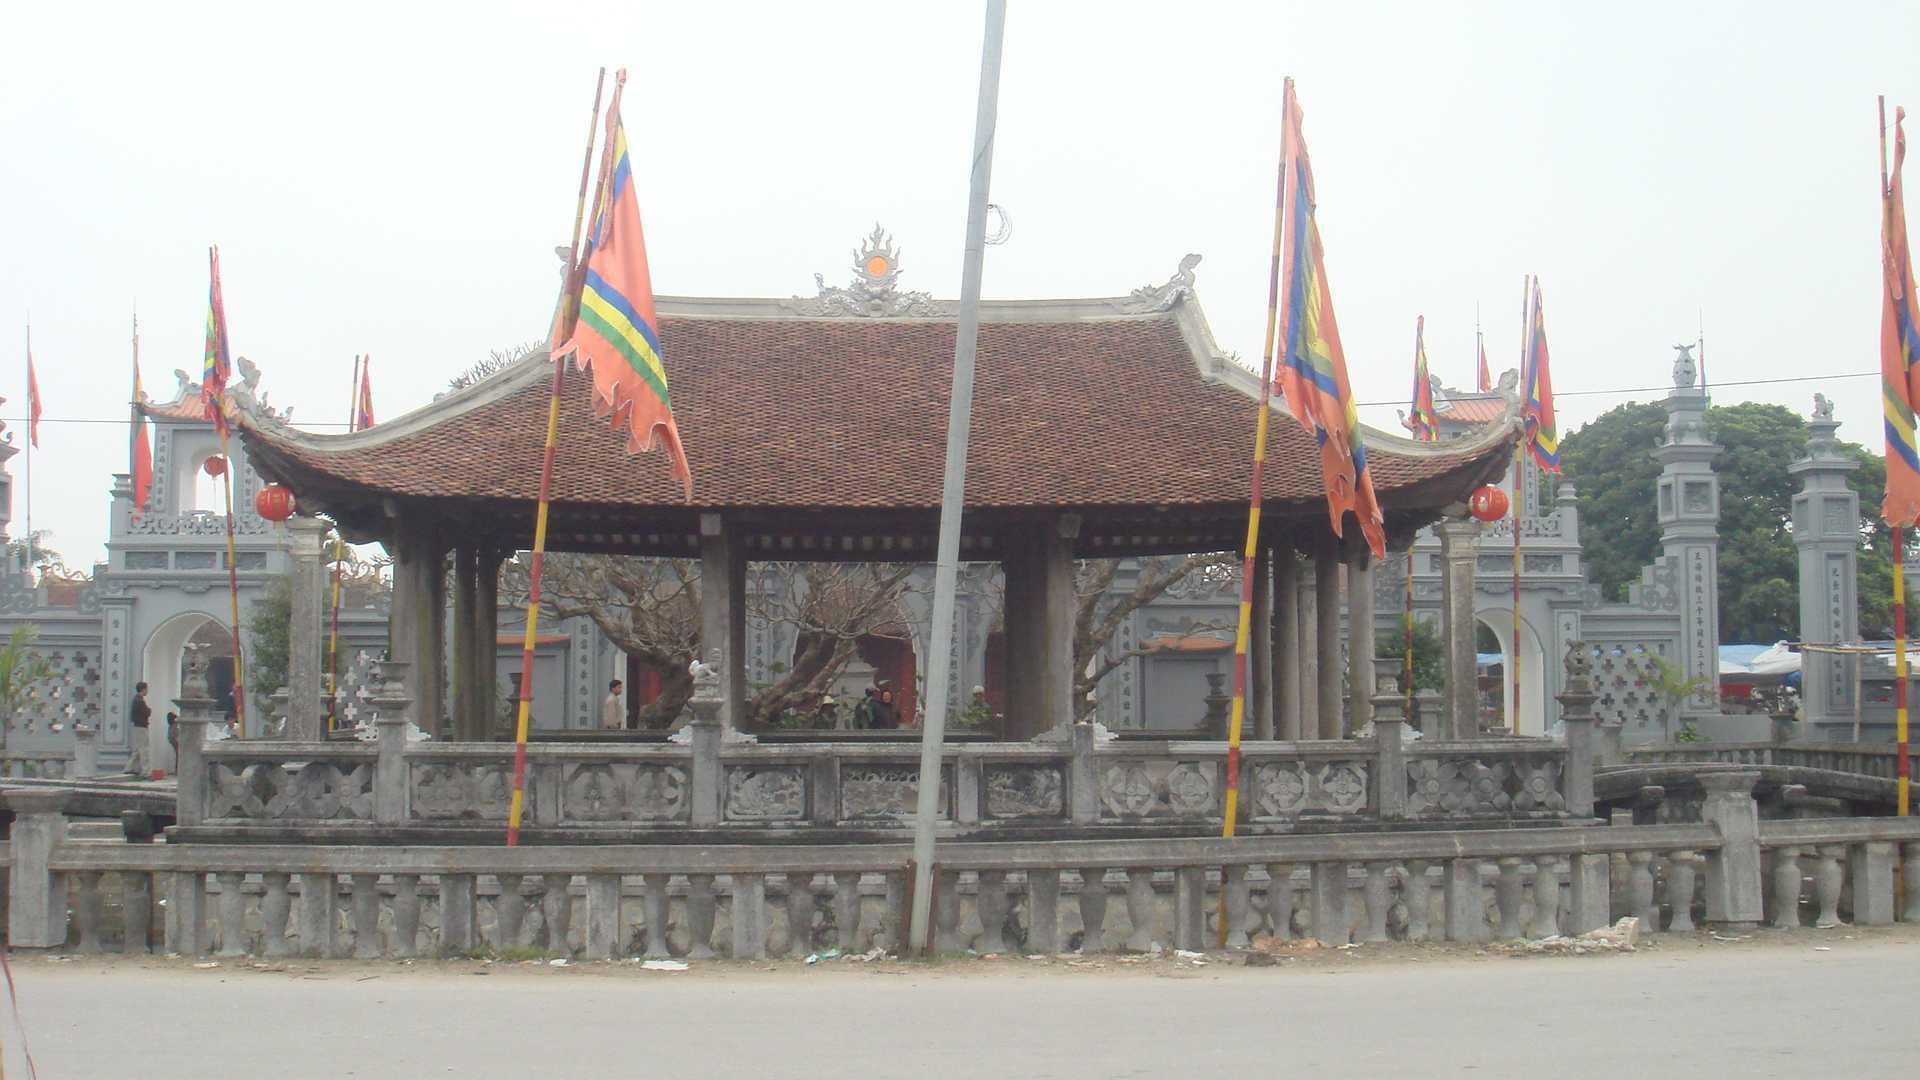 Phu Giay in Vietnam